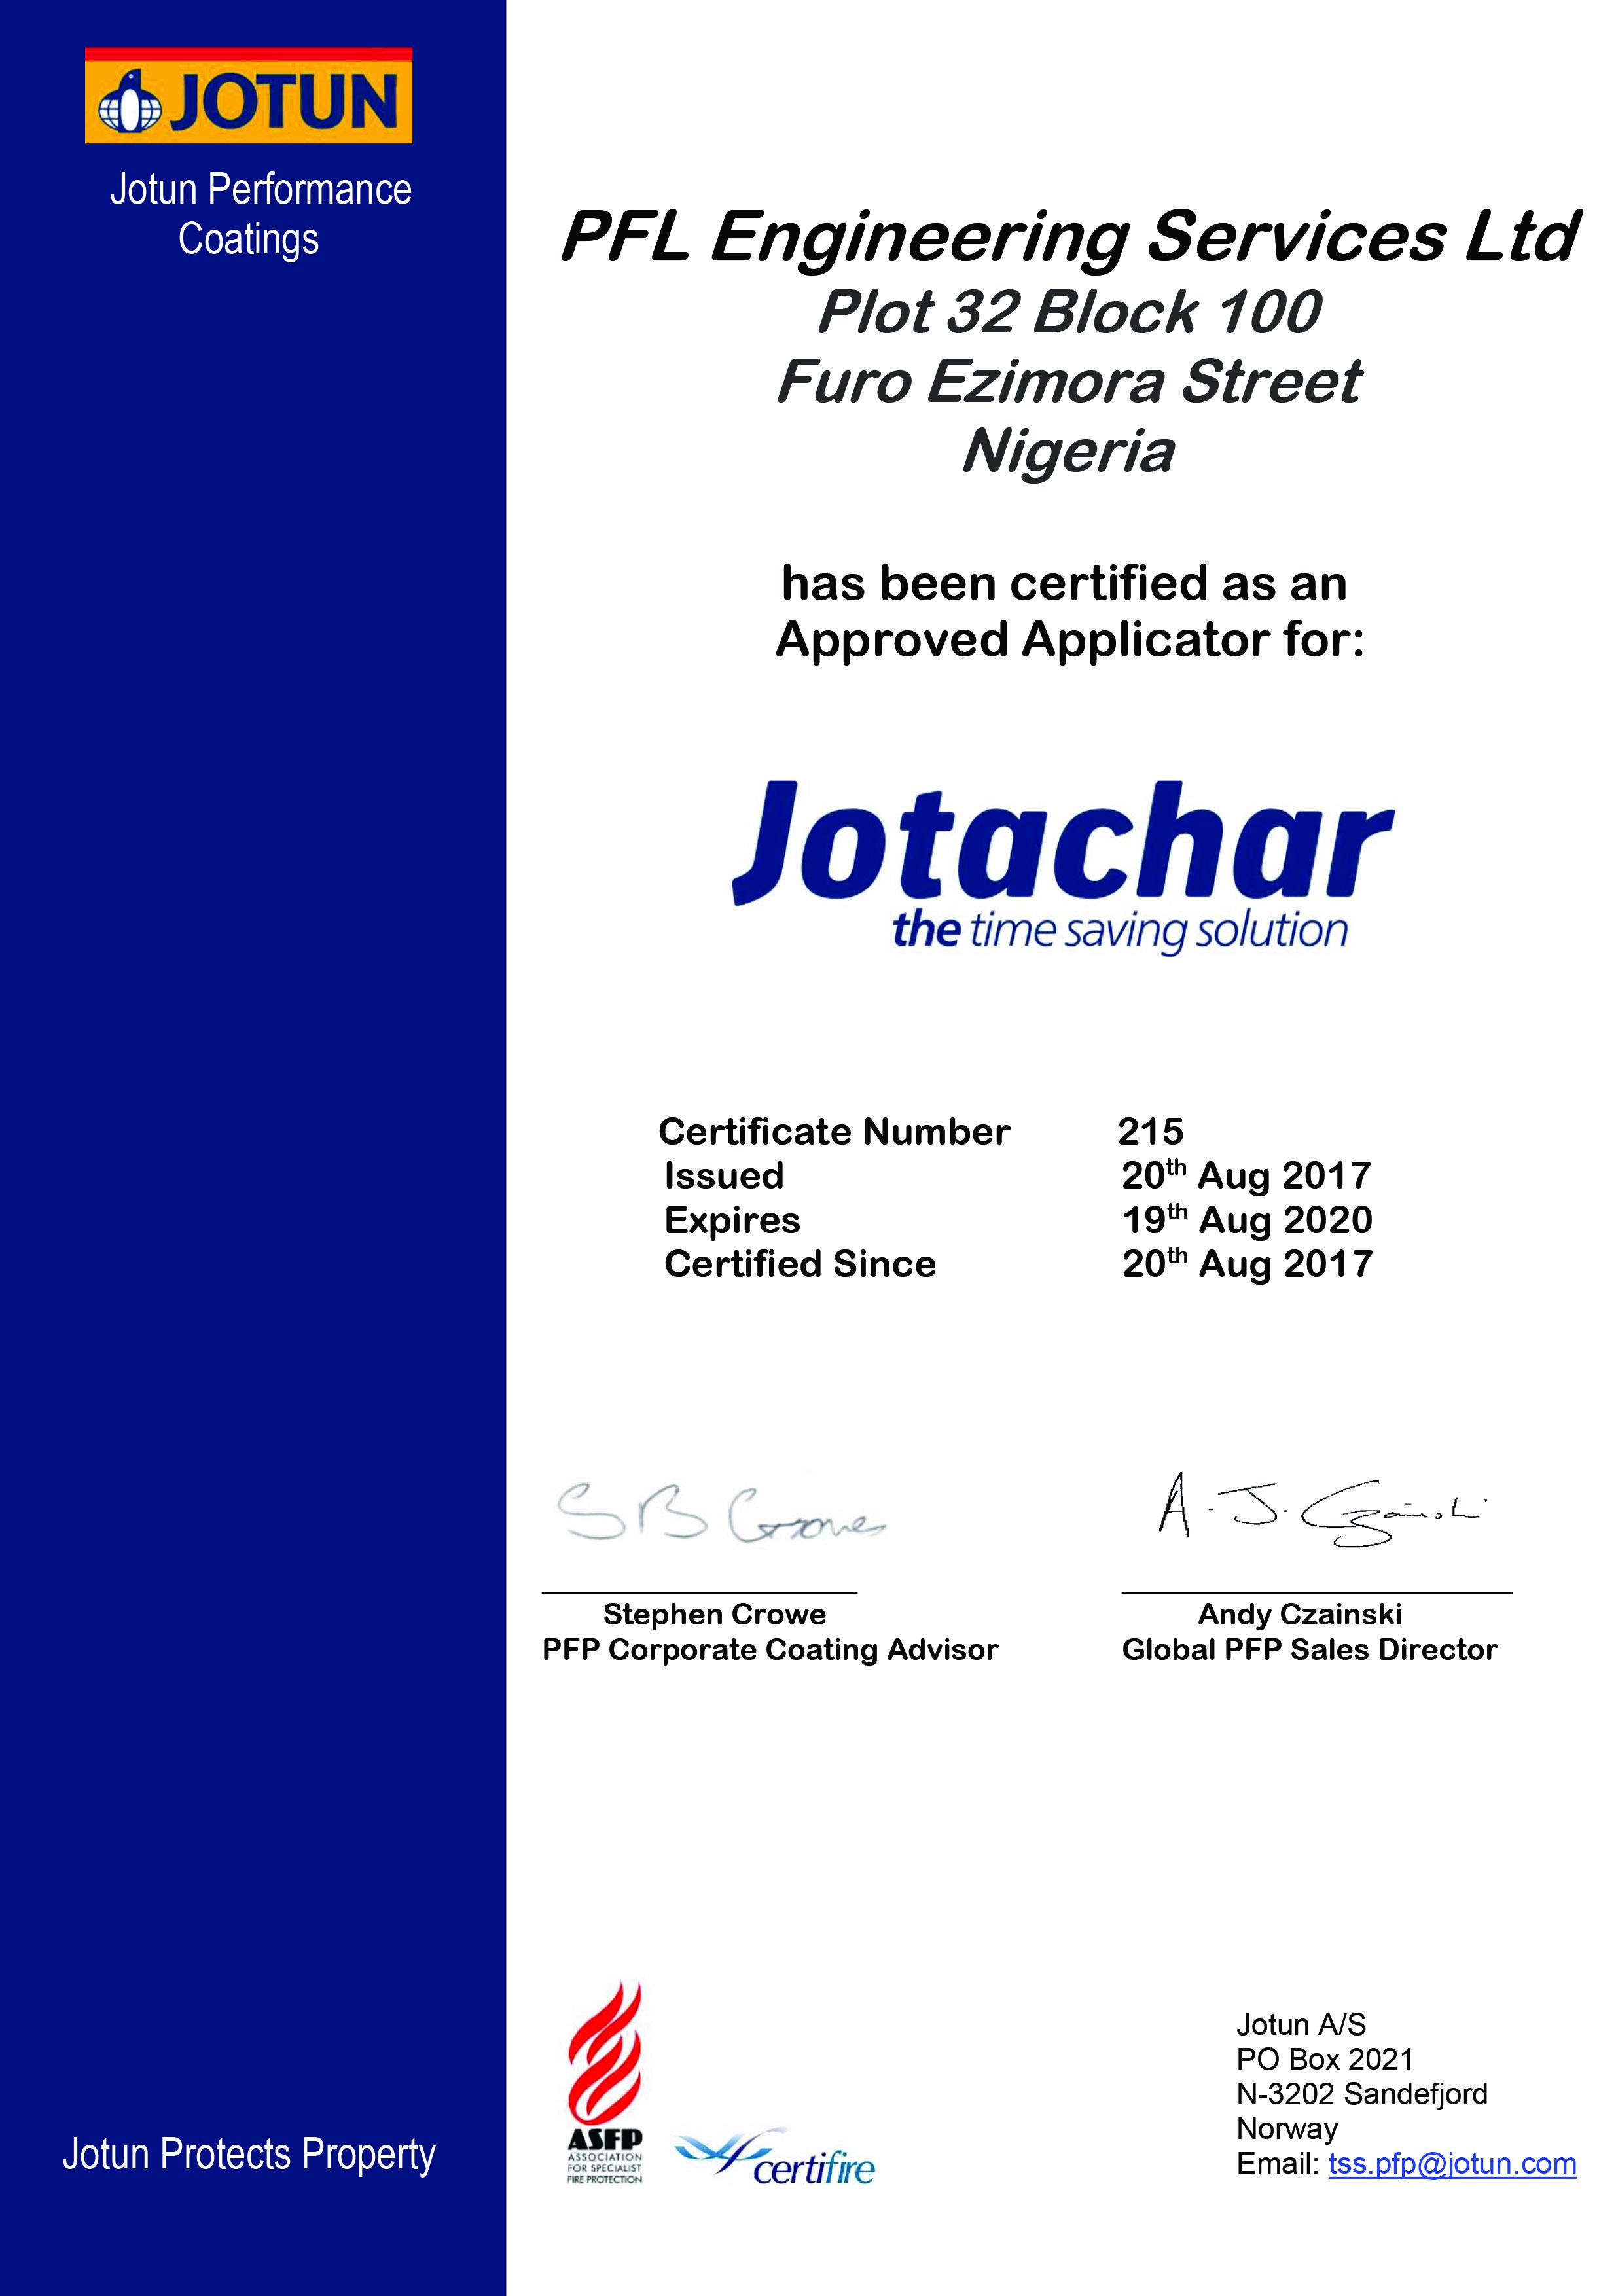 Jotachar Approved Applicator